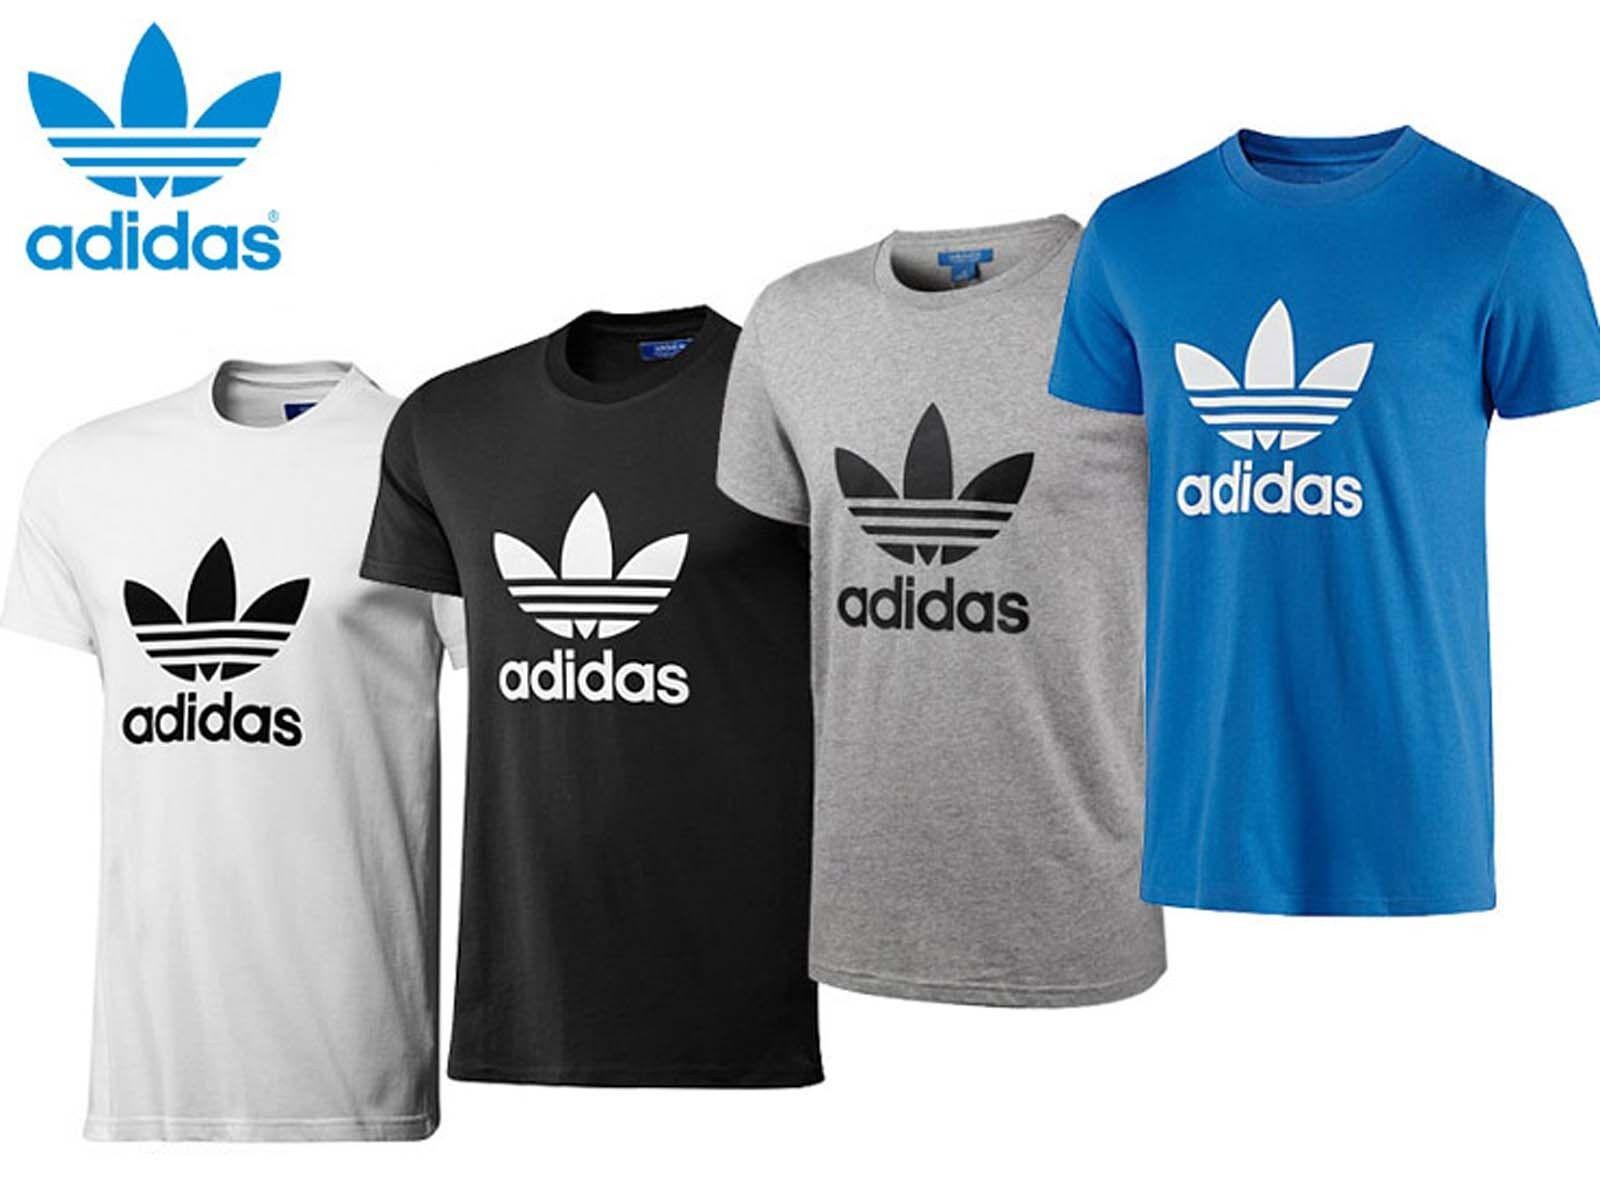 adidas originals t shirt crew neck trefoil cotton tee top. Black Bedroom Furniture Sets. Home Design Ideas